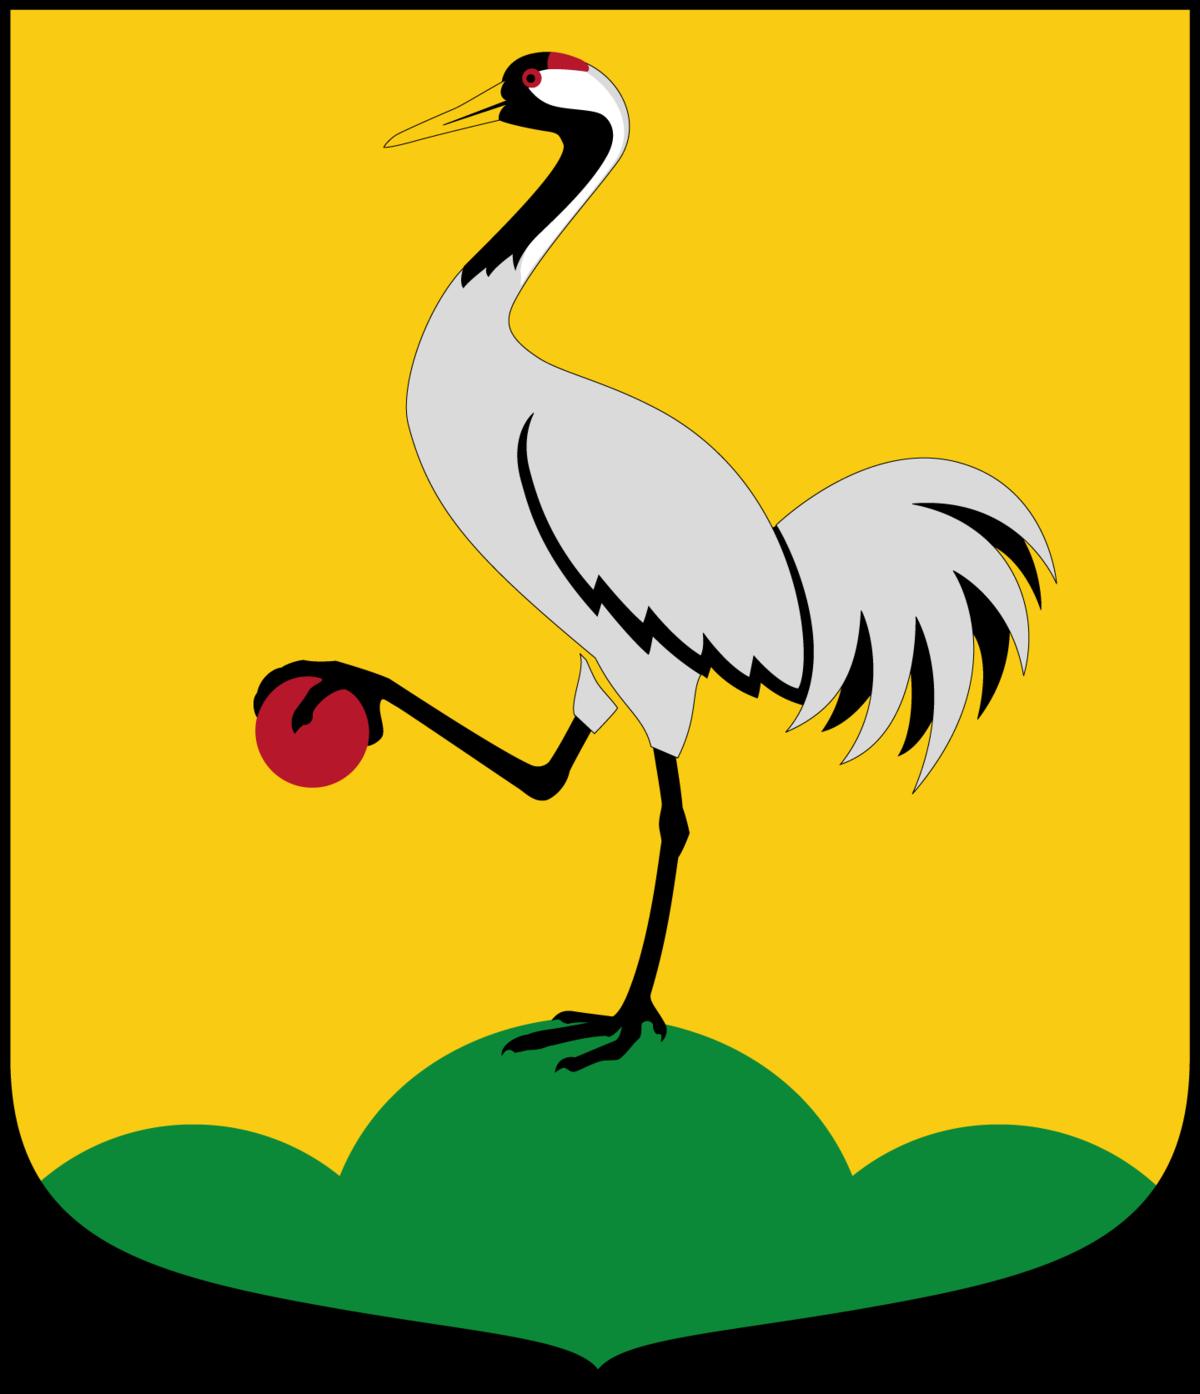 Tranås Kommun